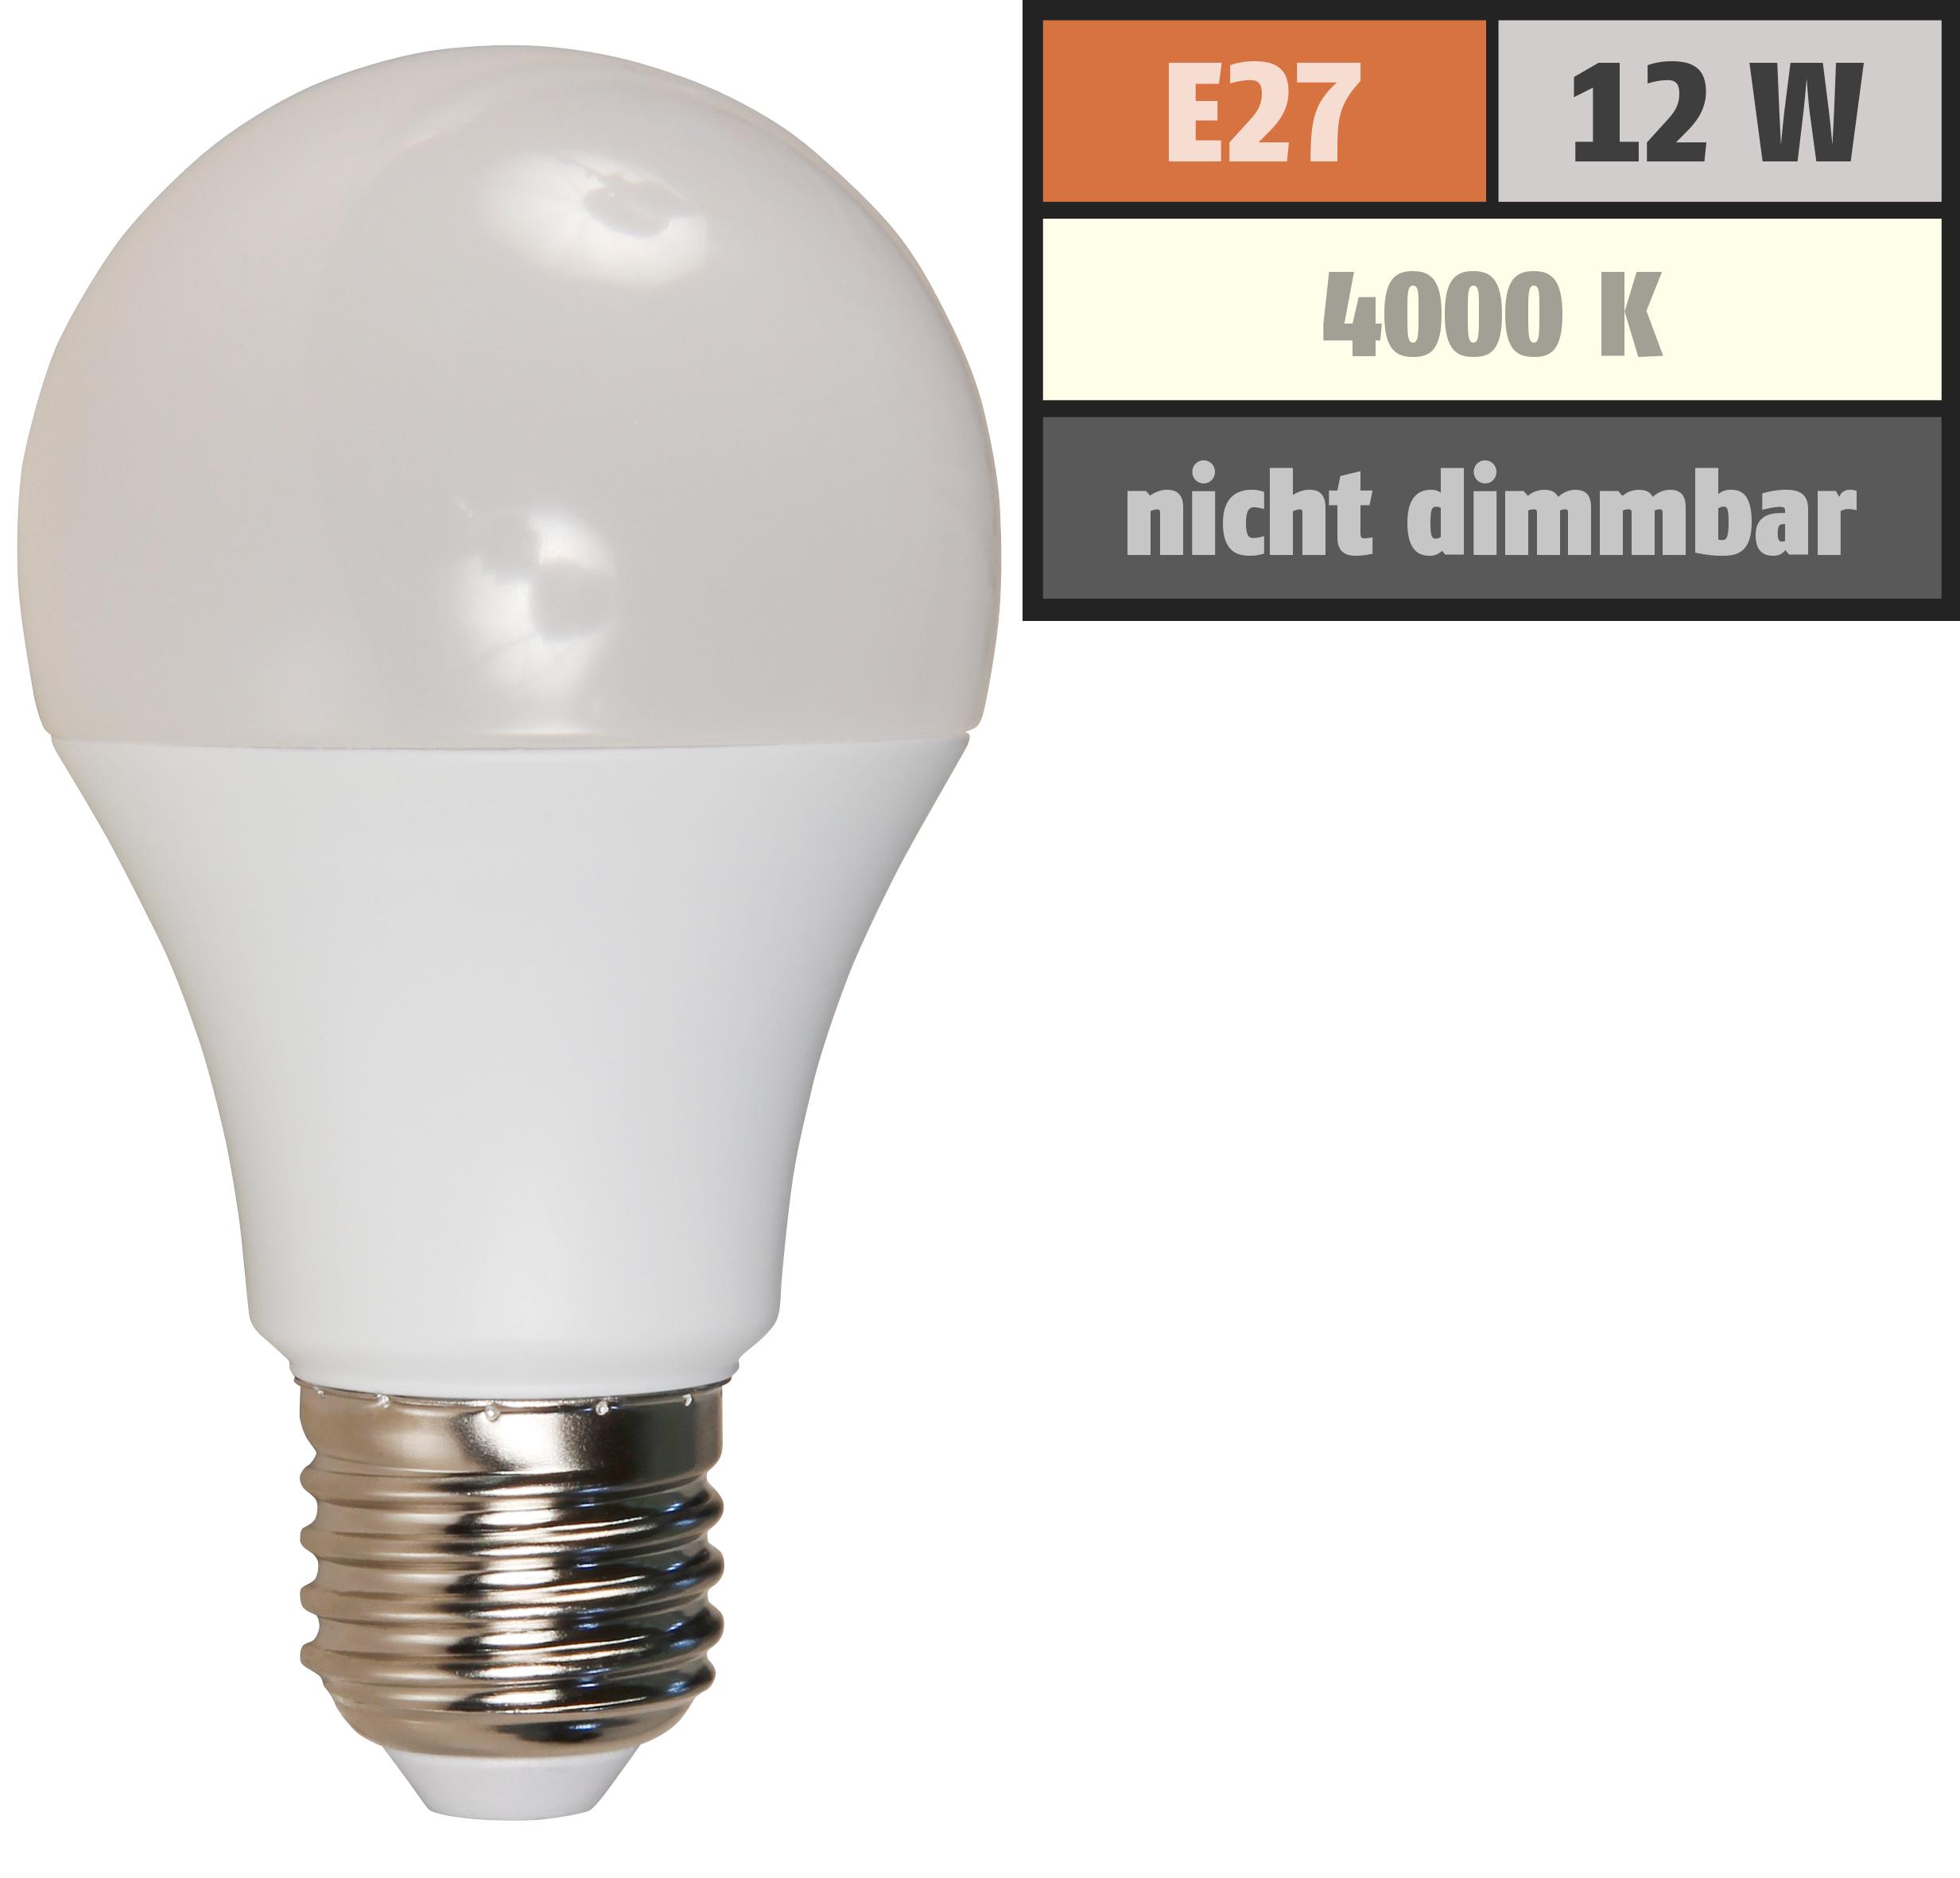 10 x Glühlampe Glühbirne Krypton Pilsform E27 60W 60 Watt matt 230V Leuchtmittel